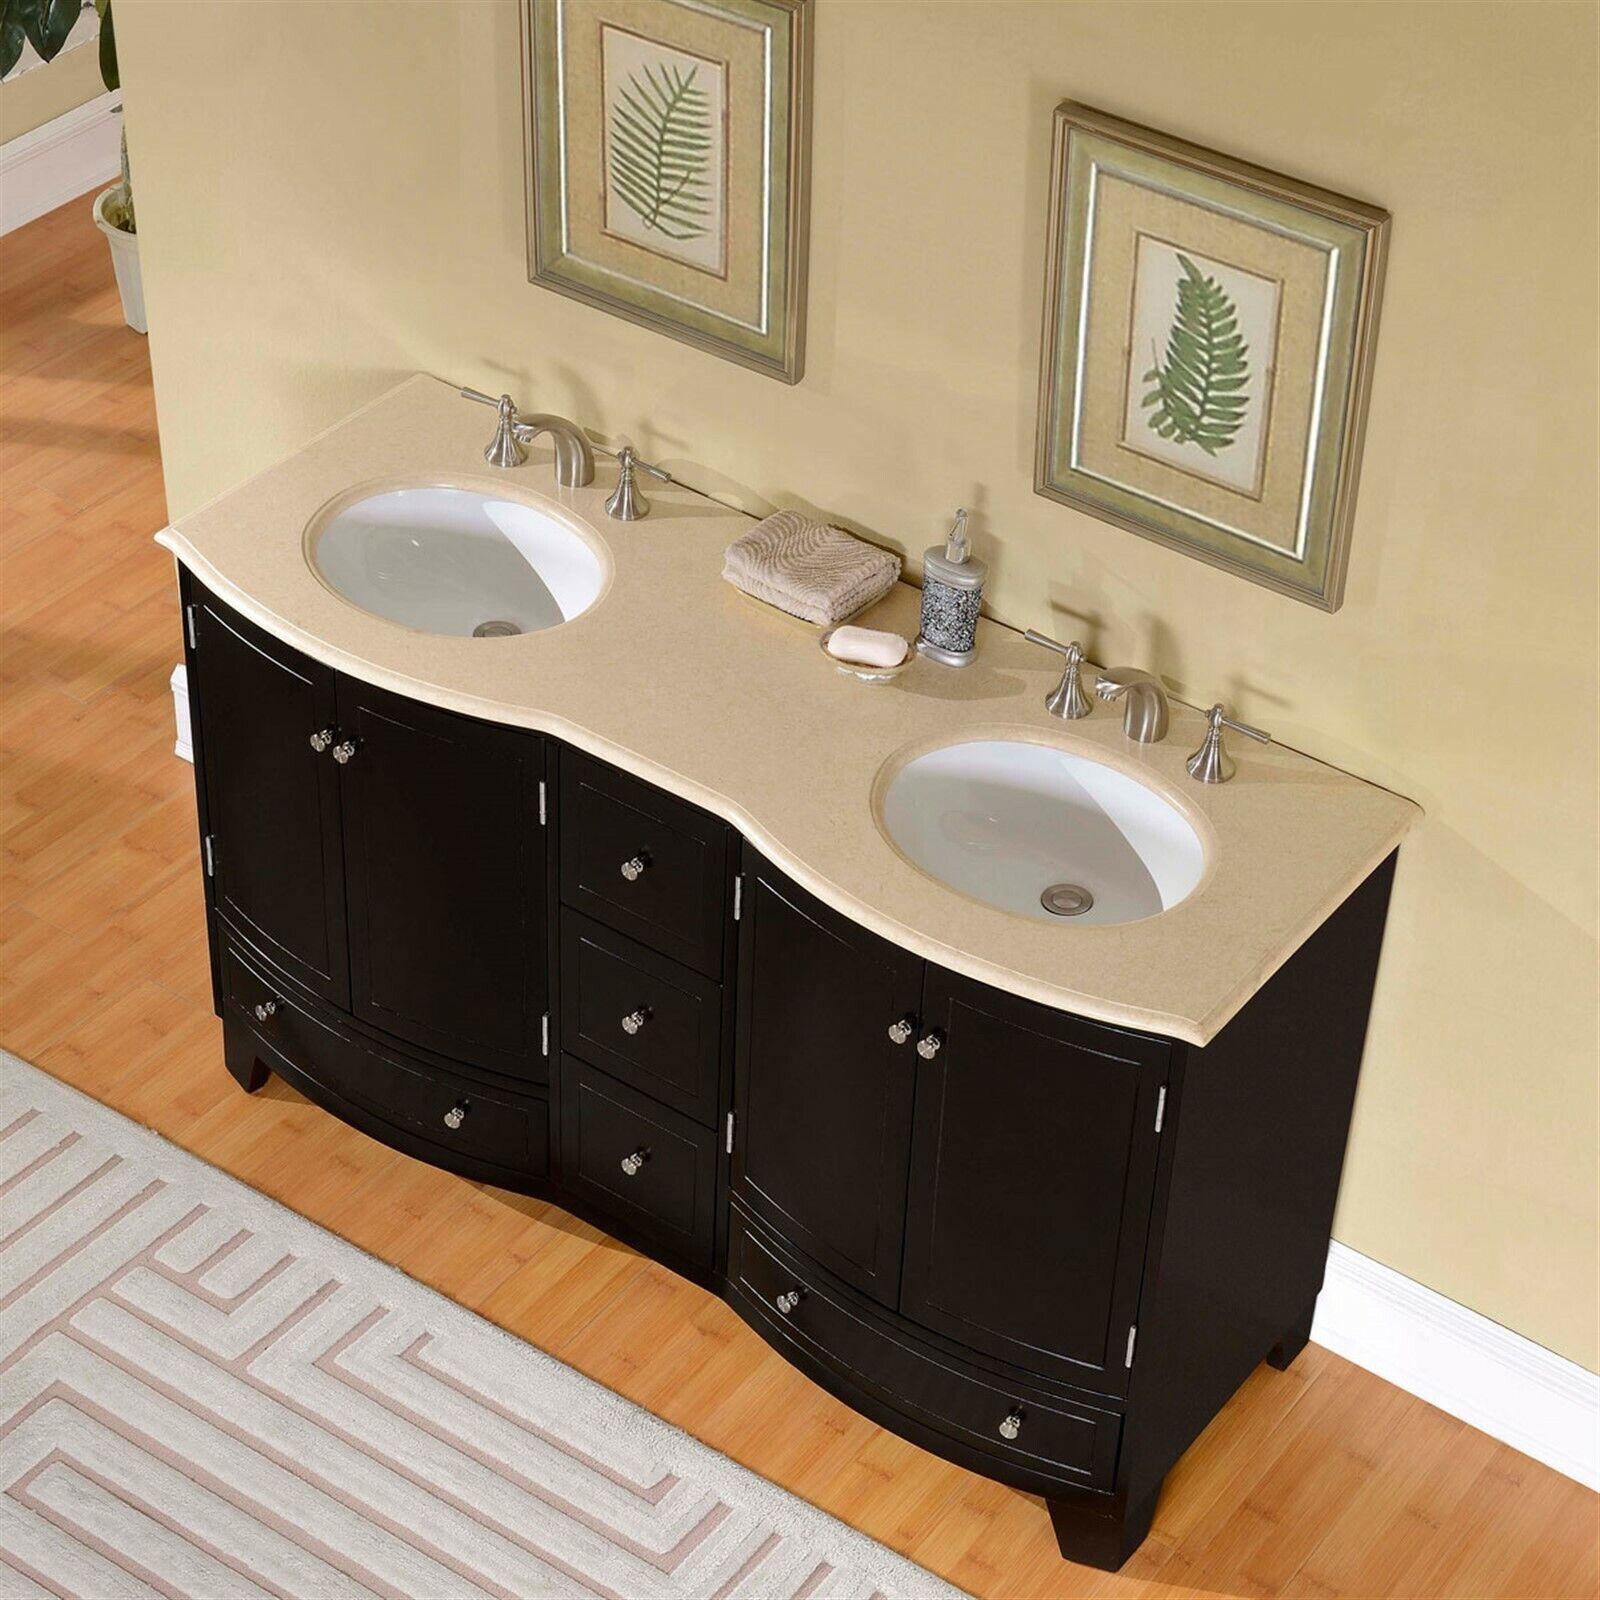 Virtu Usa Bradford 60 Inch Double Sink Bathroom Vanity Set For Sale Online Ebay